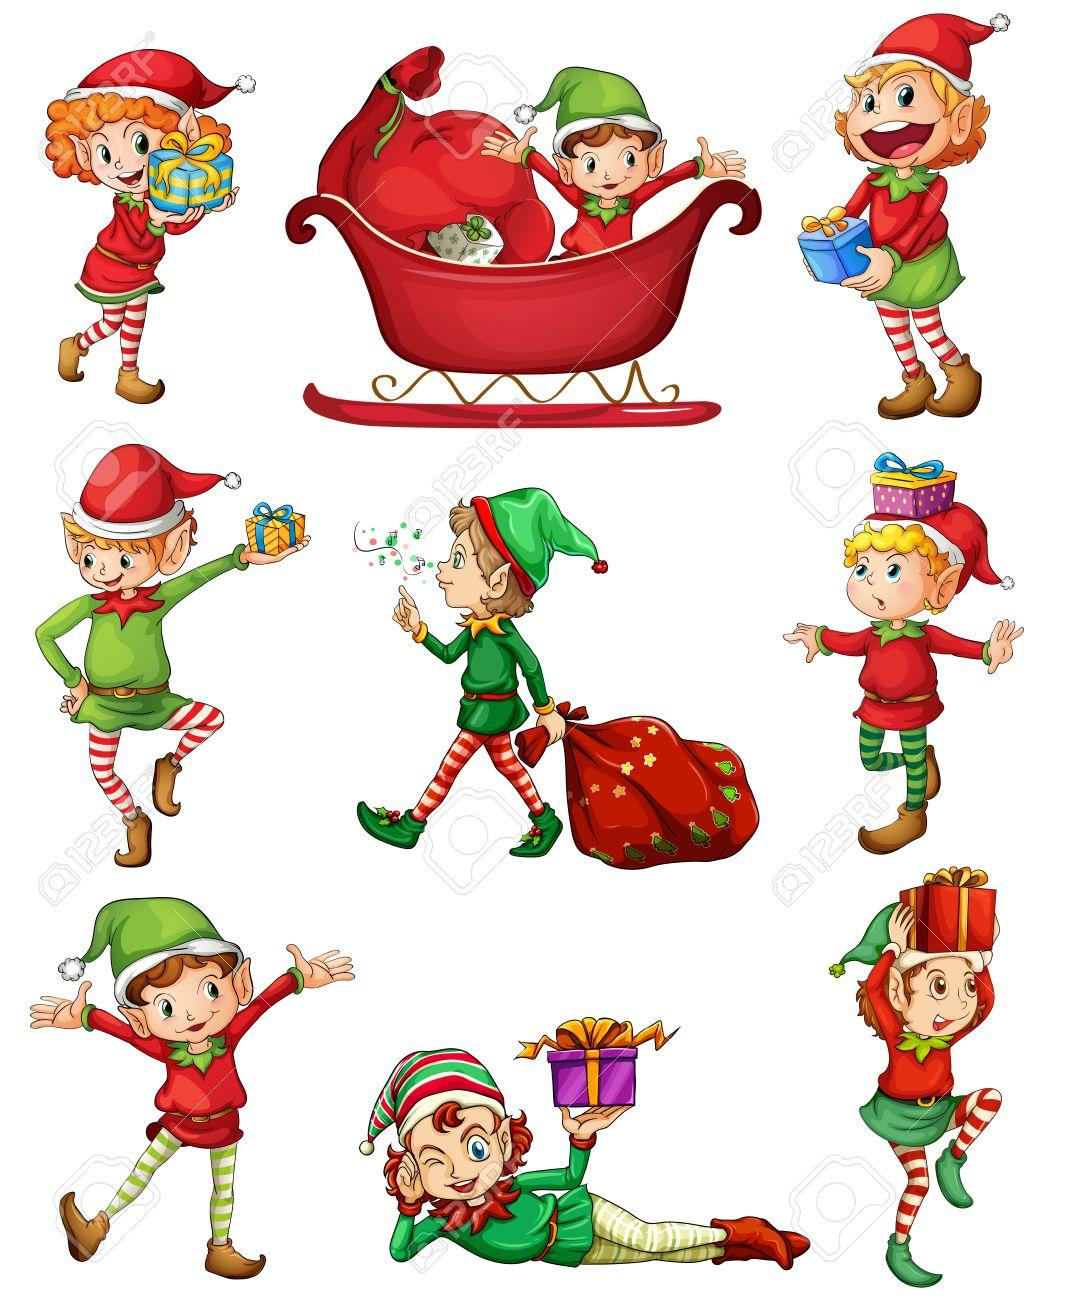 15,861 Elf Stock Illustrations, Cliparts And Royalty Free Elf Vectors